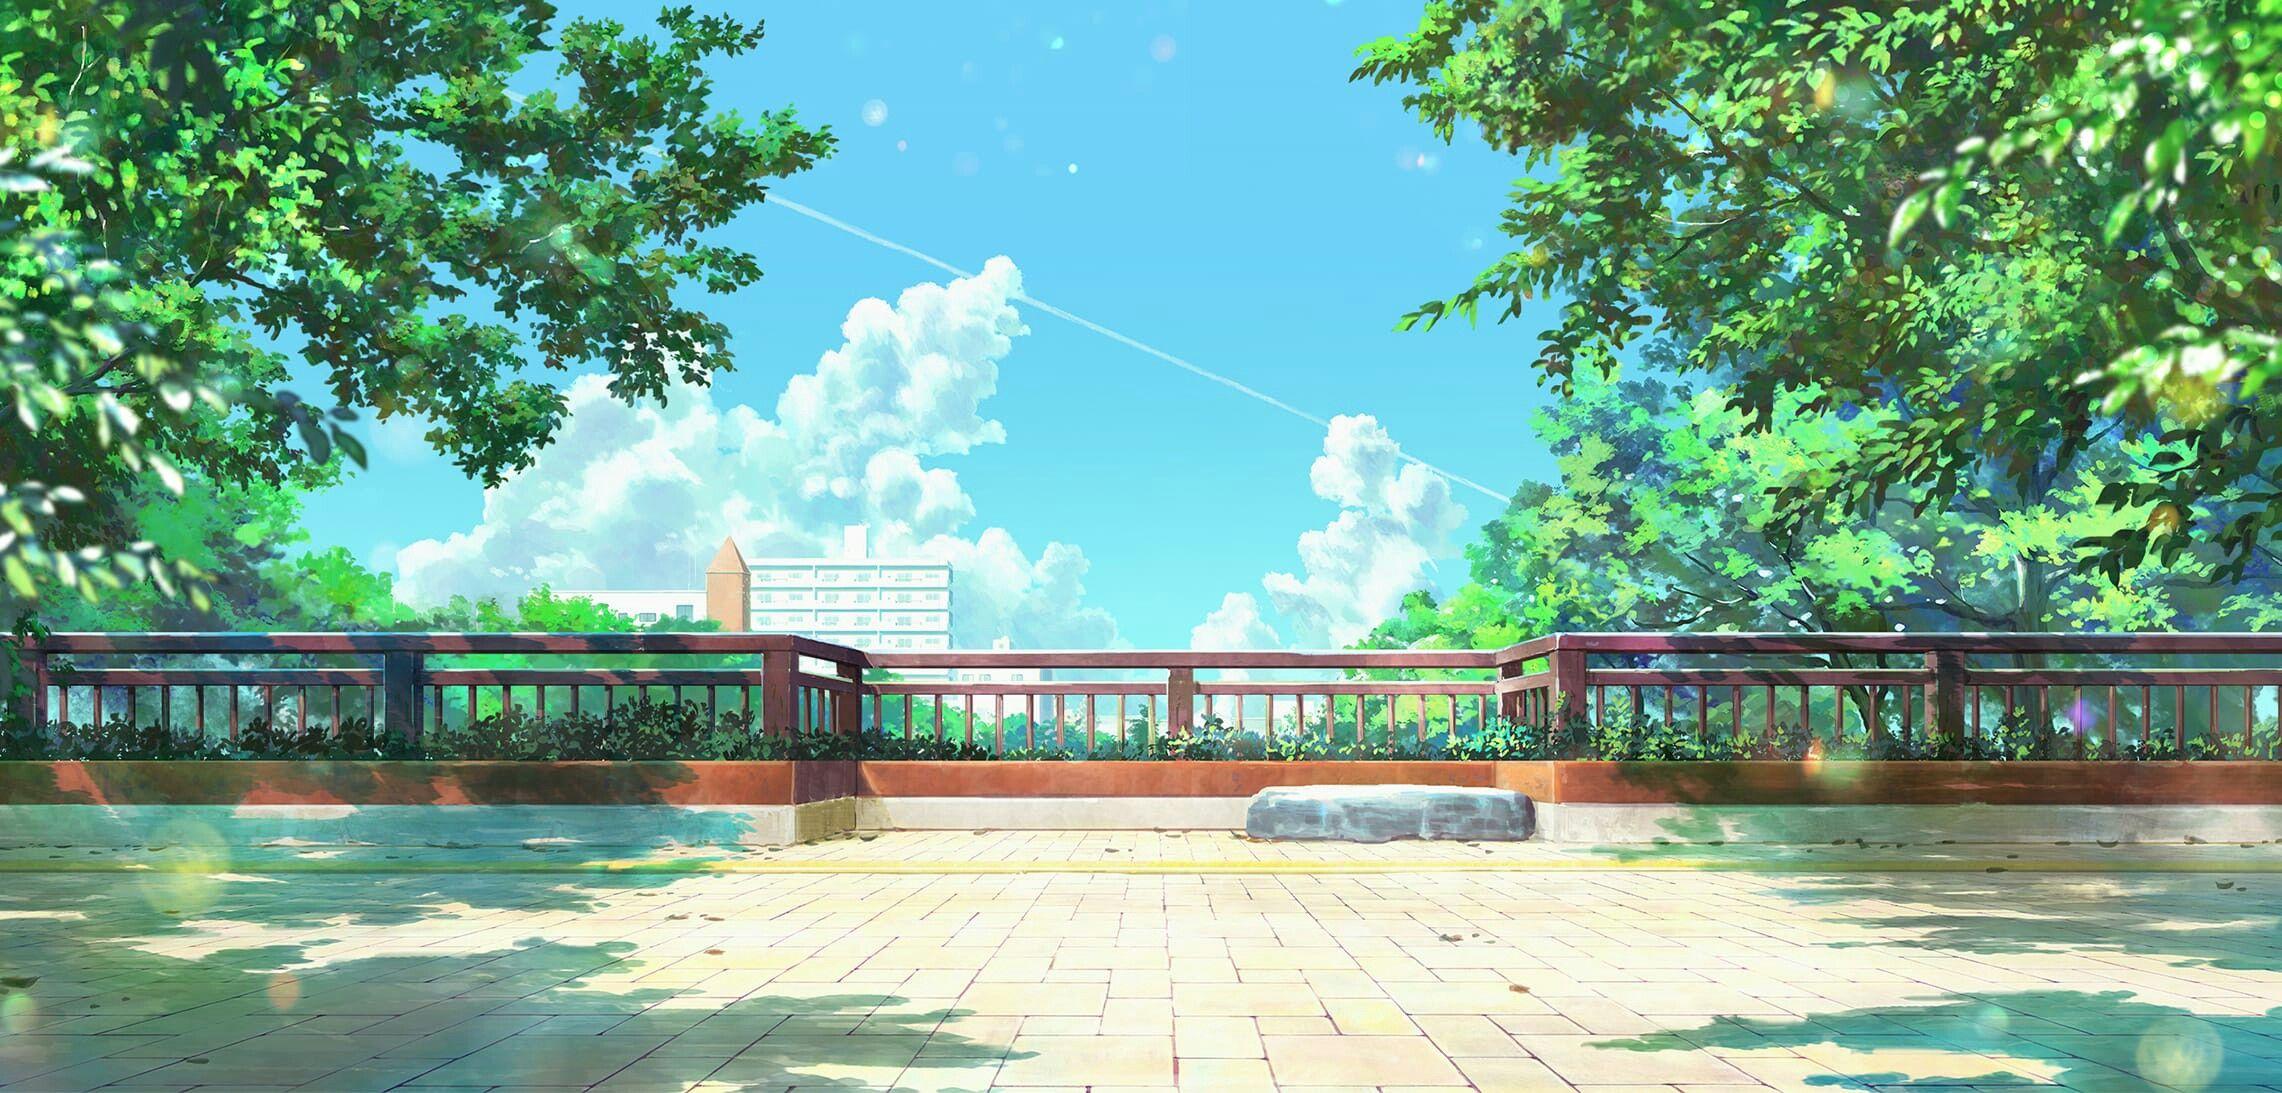 A Silent Voice, Koe no Katachi, Comedy, Drama, Romance ...